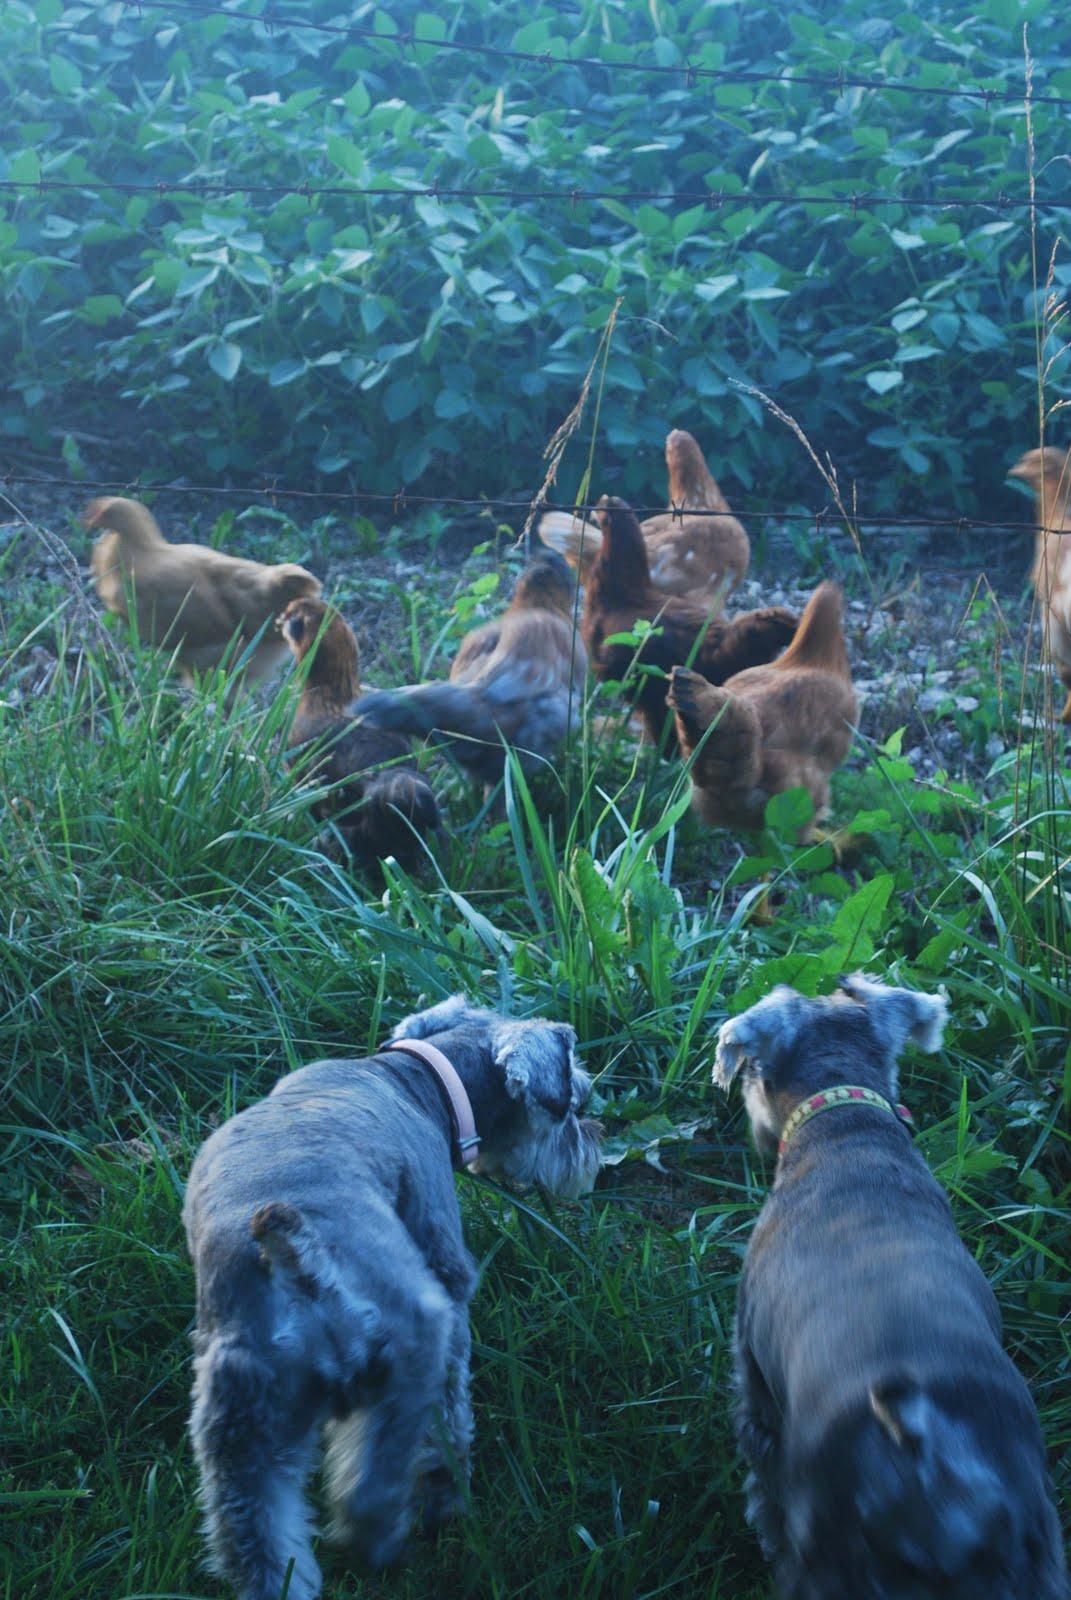 http://1.bp.blogspot.com/-g12-eiB57-c/TleQ4FScgKI/AAAAAAAAEHY/3zIJGzufDtI/s1600/dogs+and+chickens.jpg